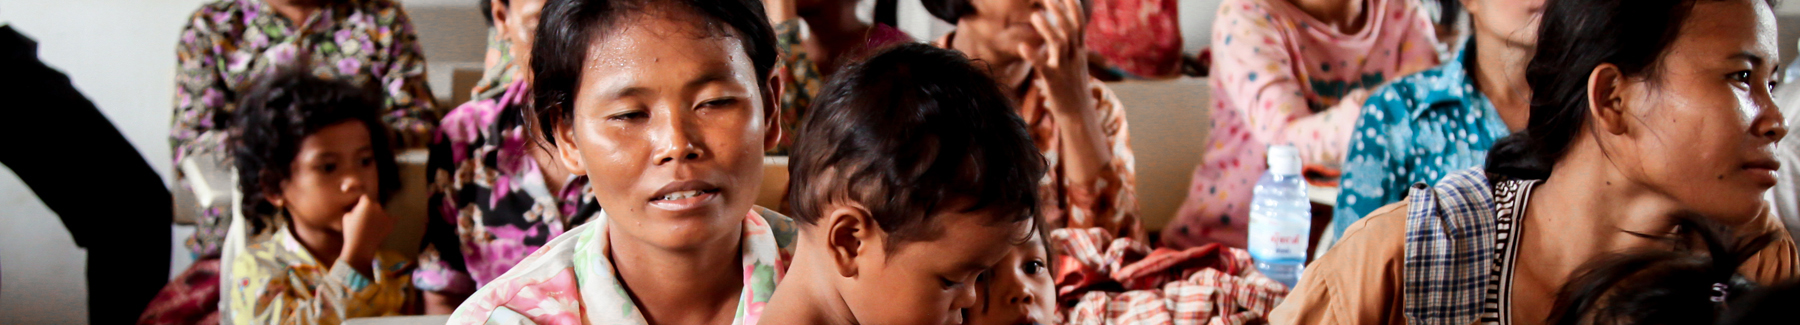 Women participate in a reproductive health voucher program.